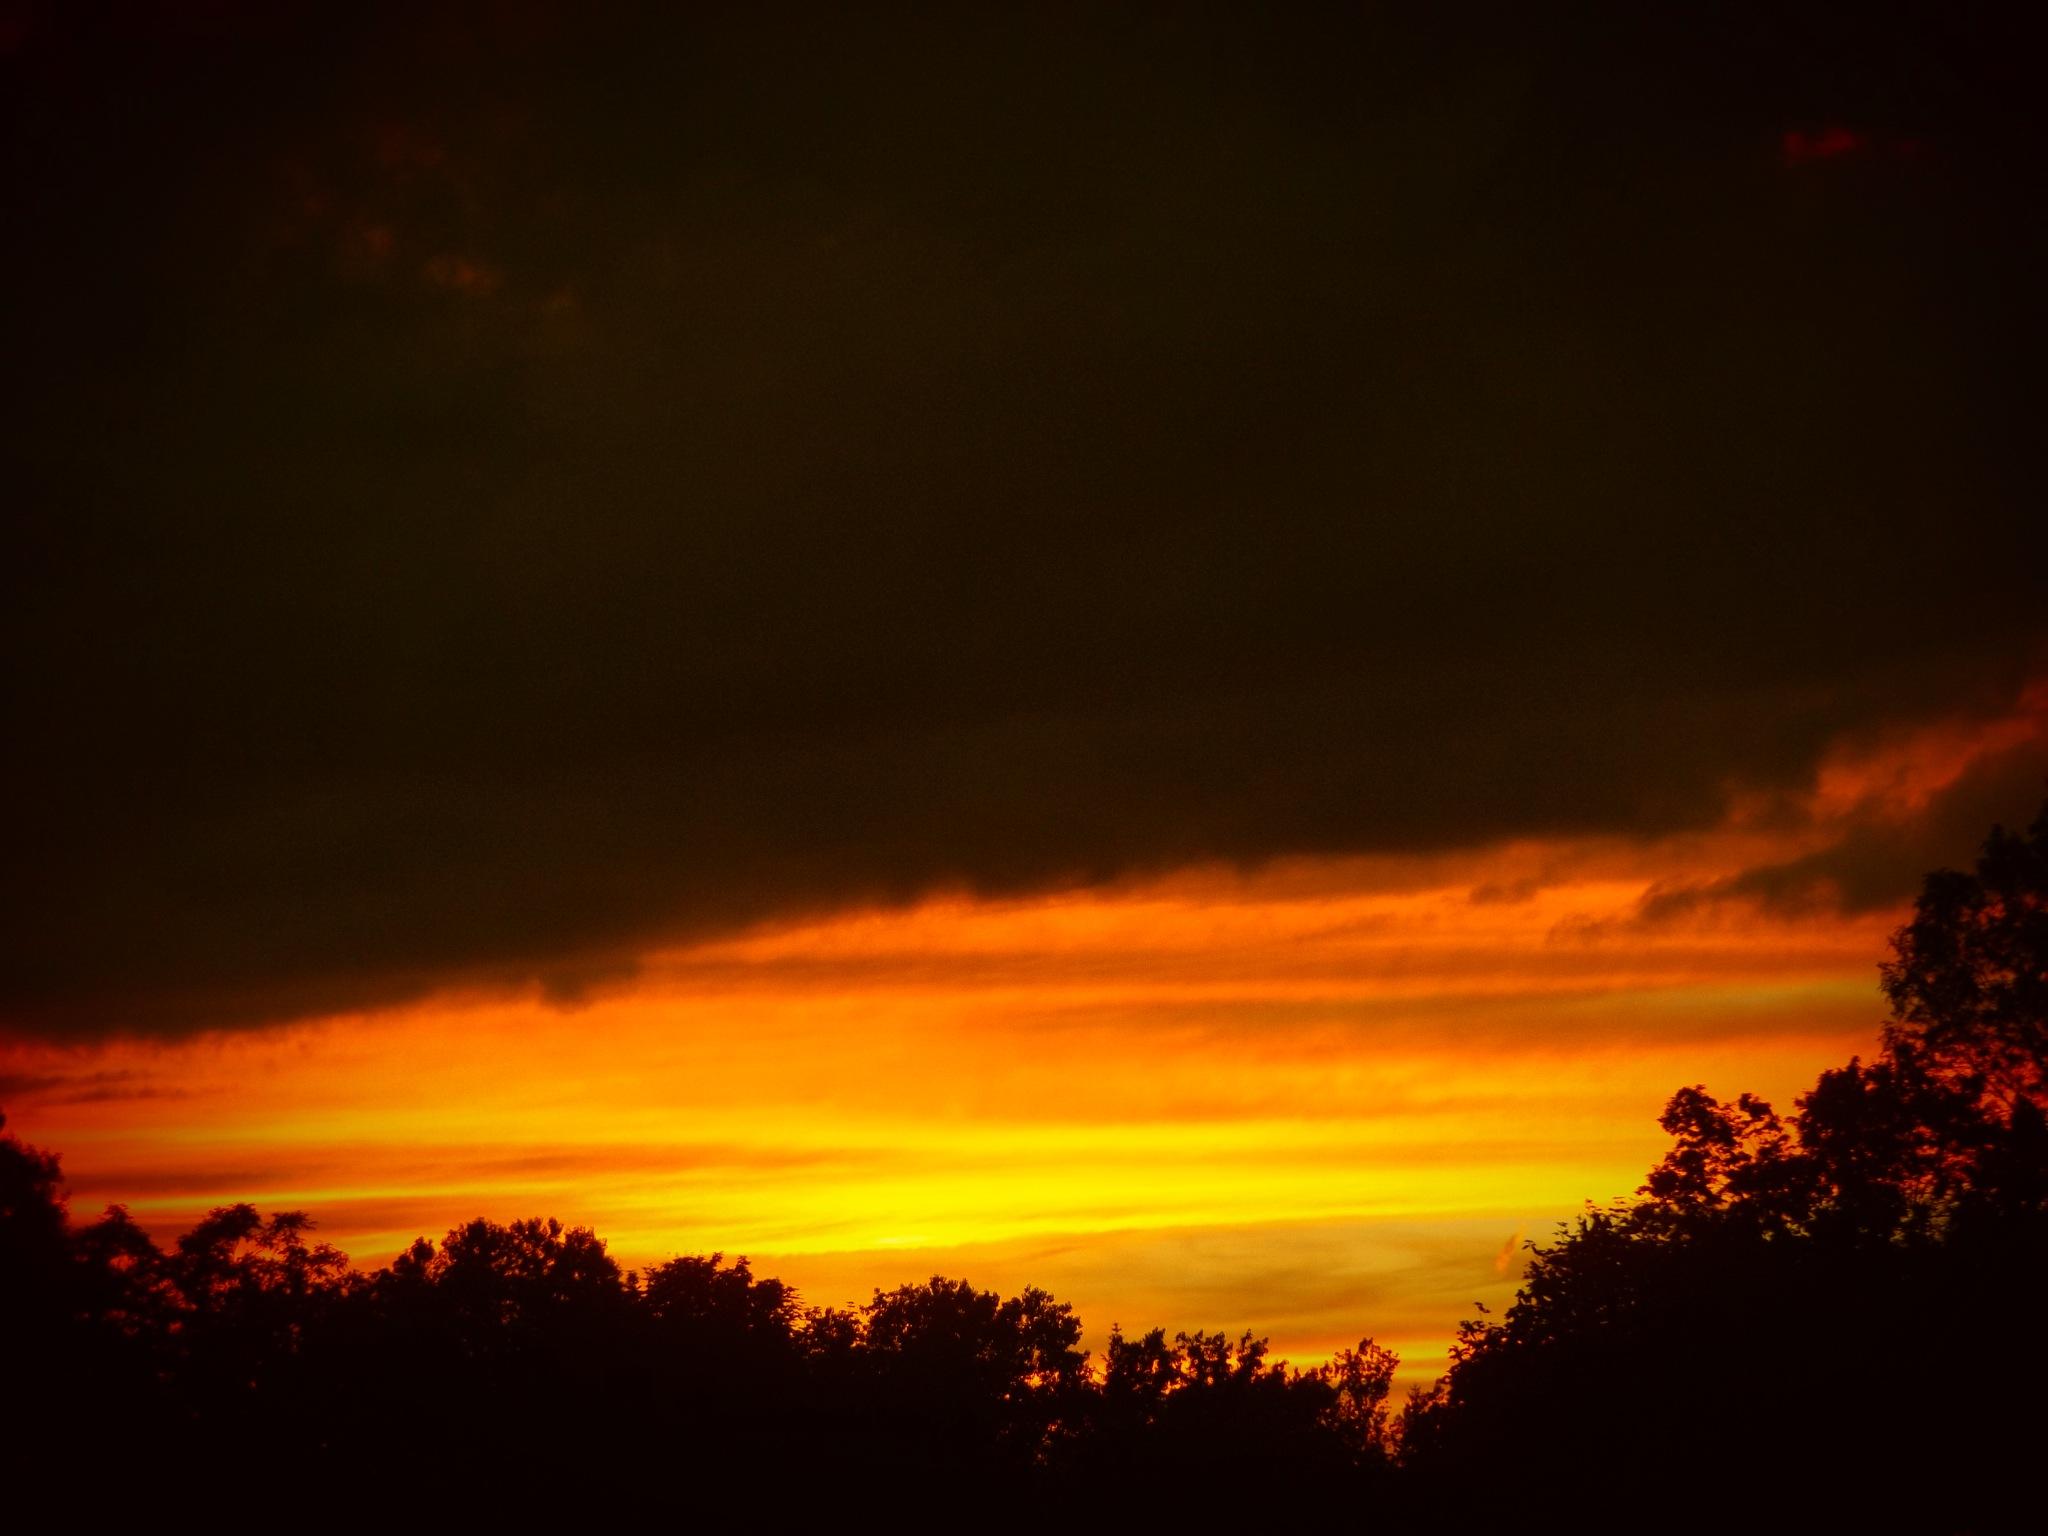 SUNSET IN RIDGEWAY NEW YORK by Dawn Hoffmeister